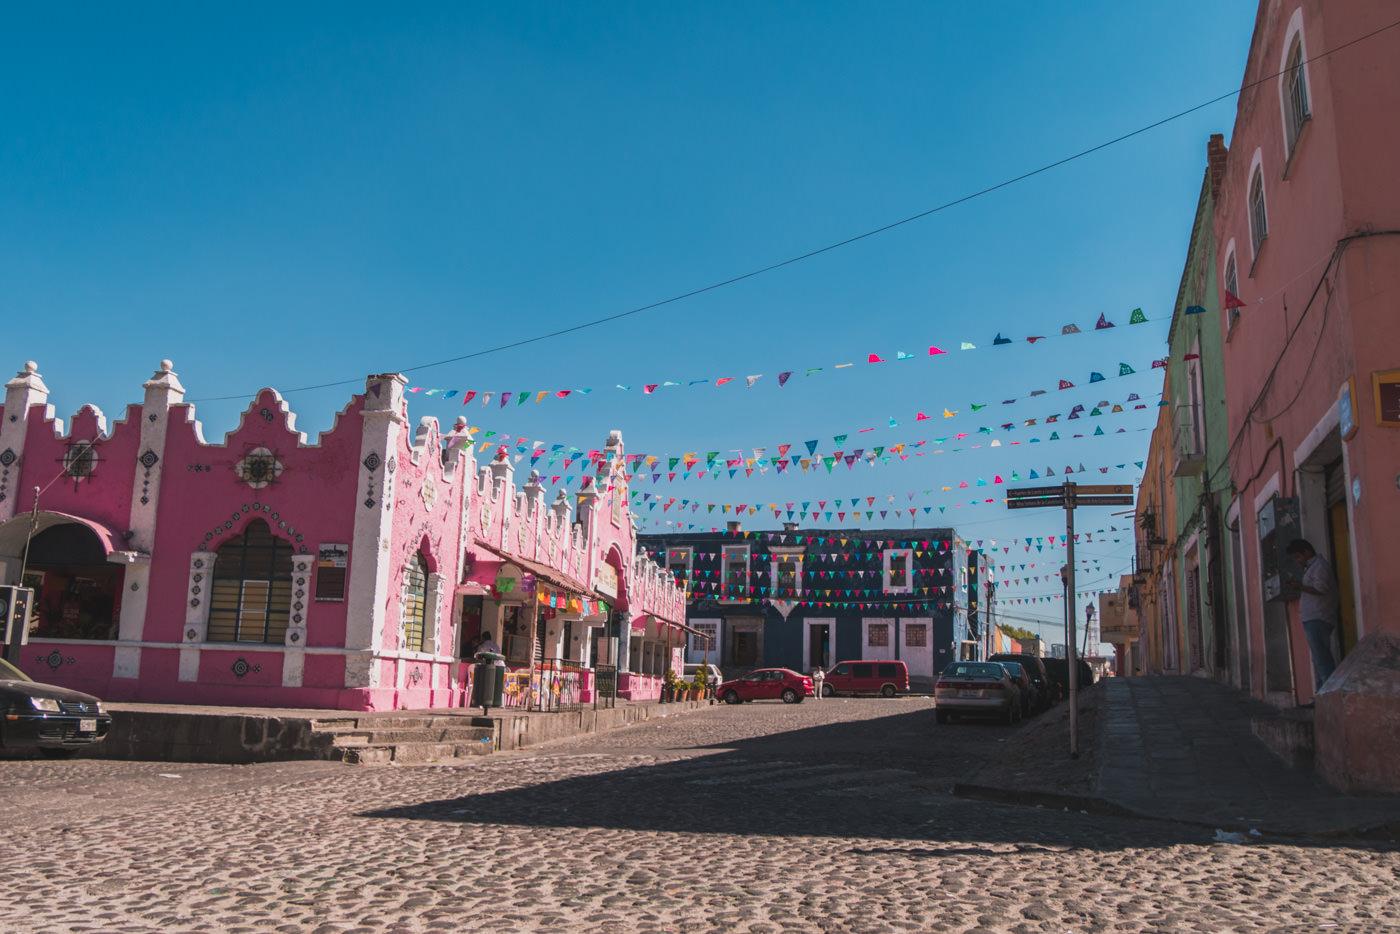 Pinkes Haus in Puebla